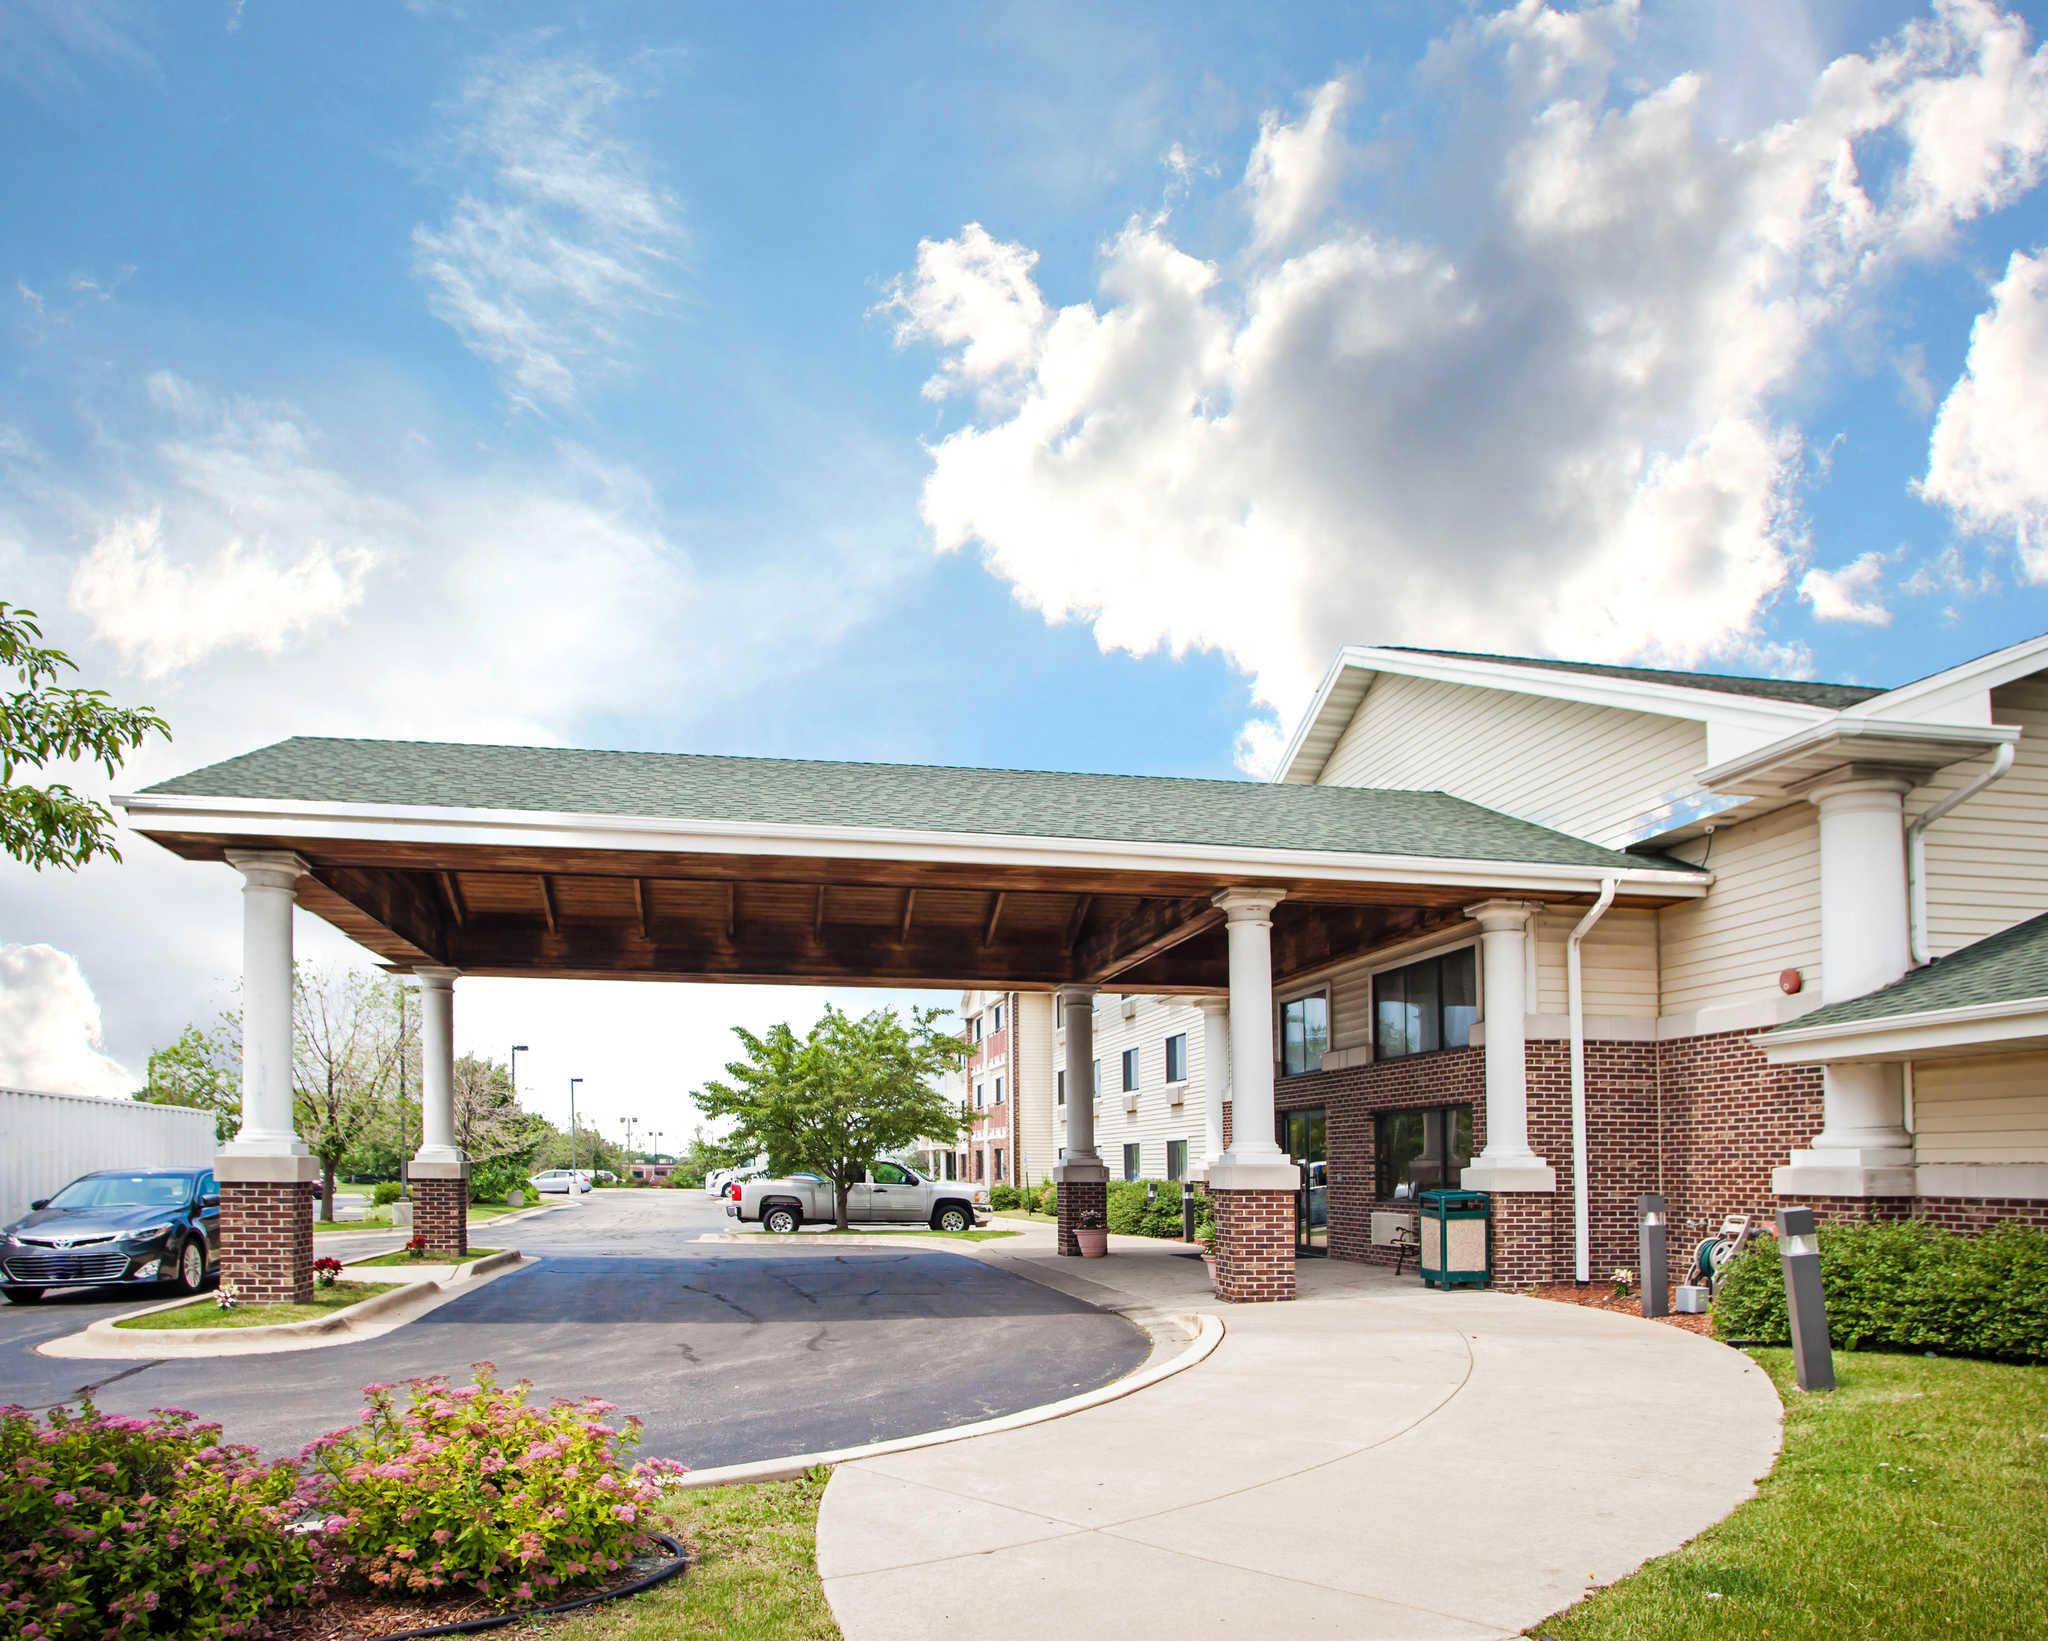 Hotels In Bolingbrook Il Area